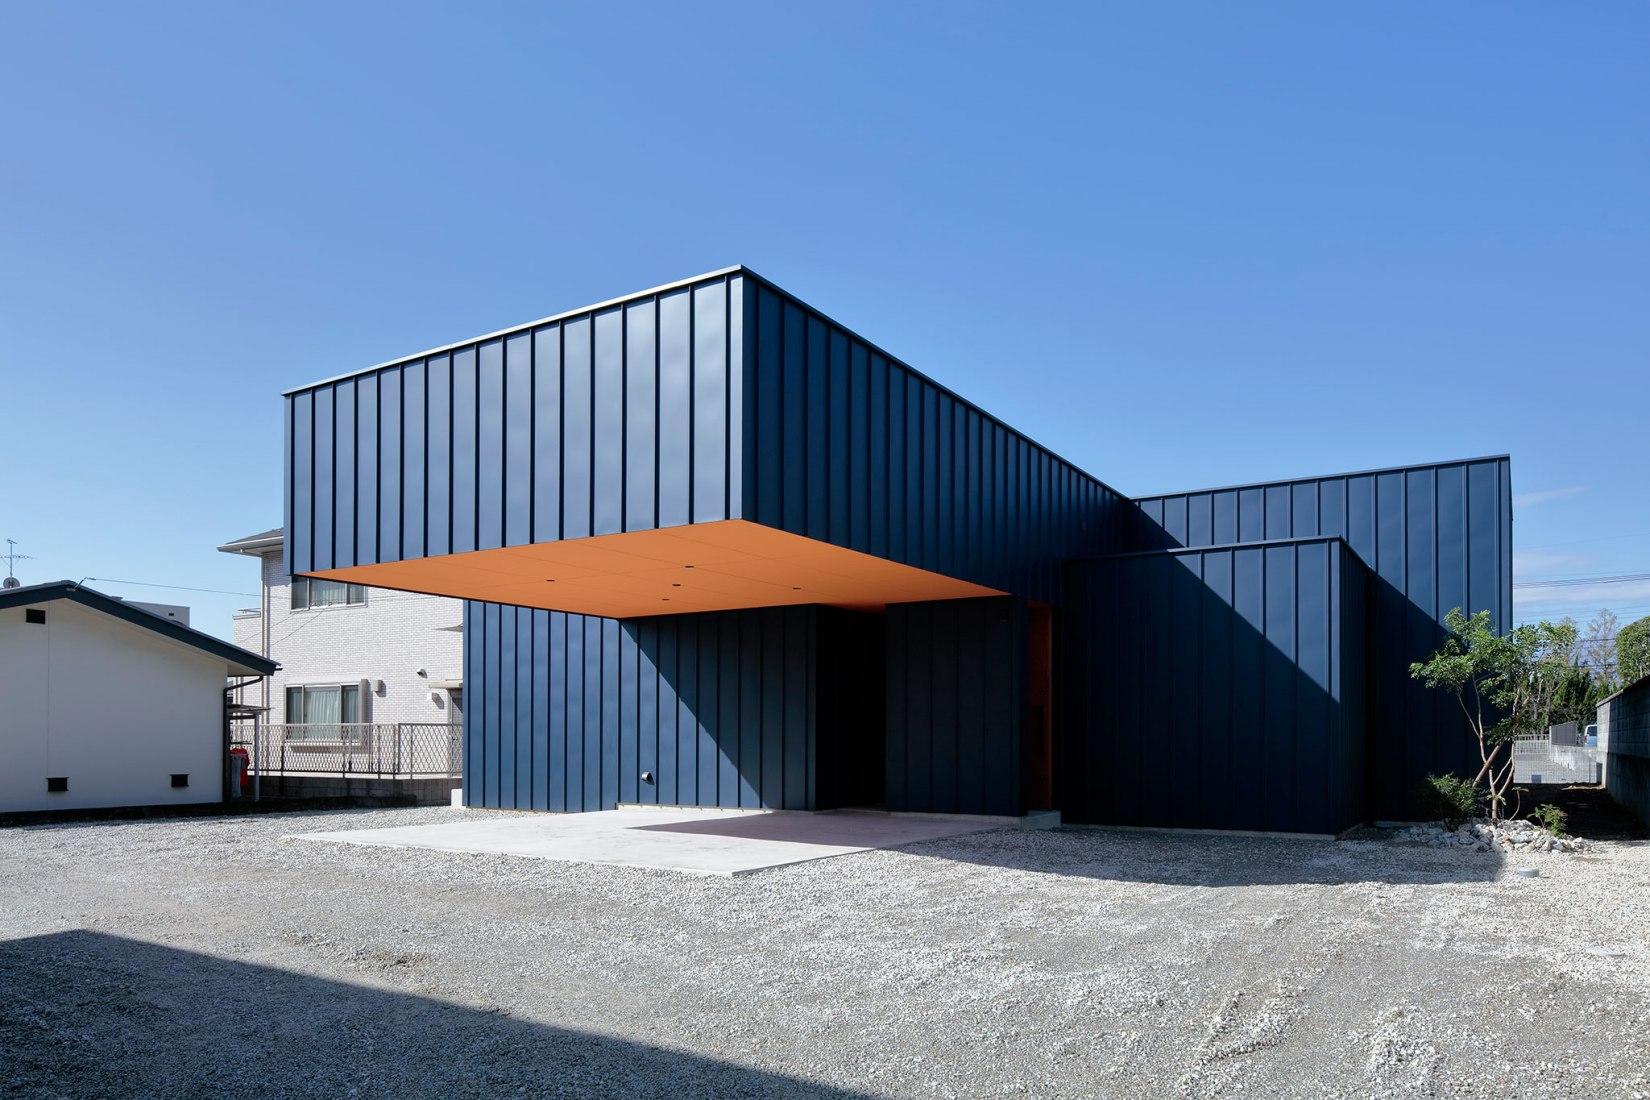 Garden Outline House by Takanori Ineyama Architects. Photograph by Koichi Torimura.